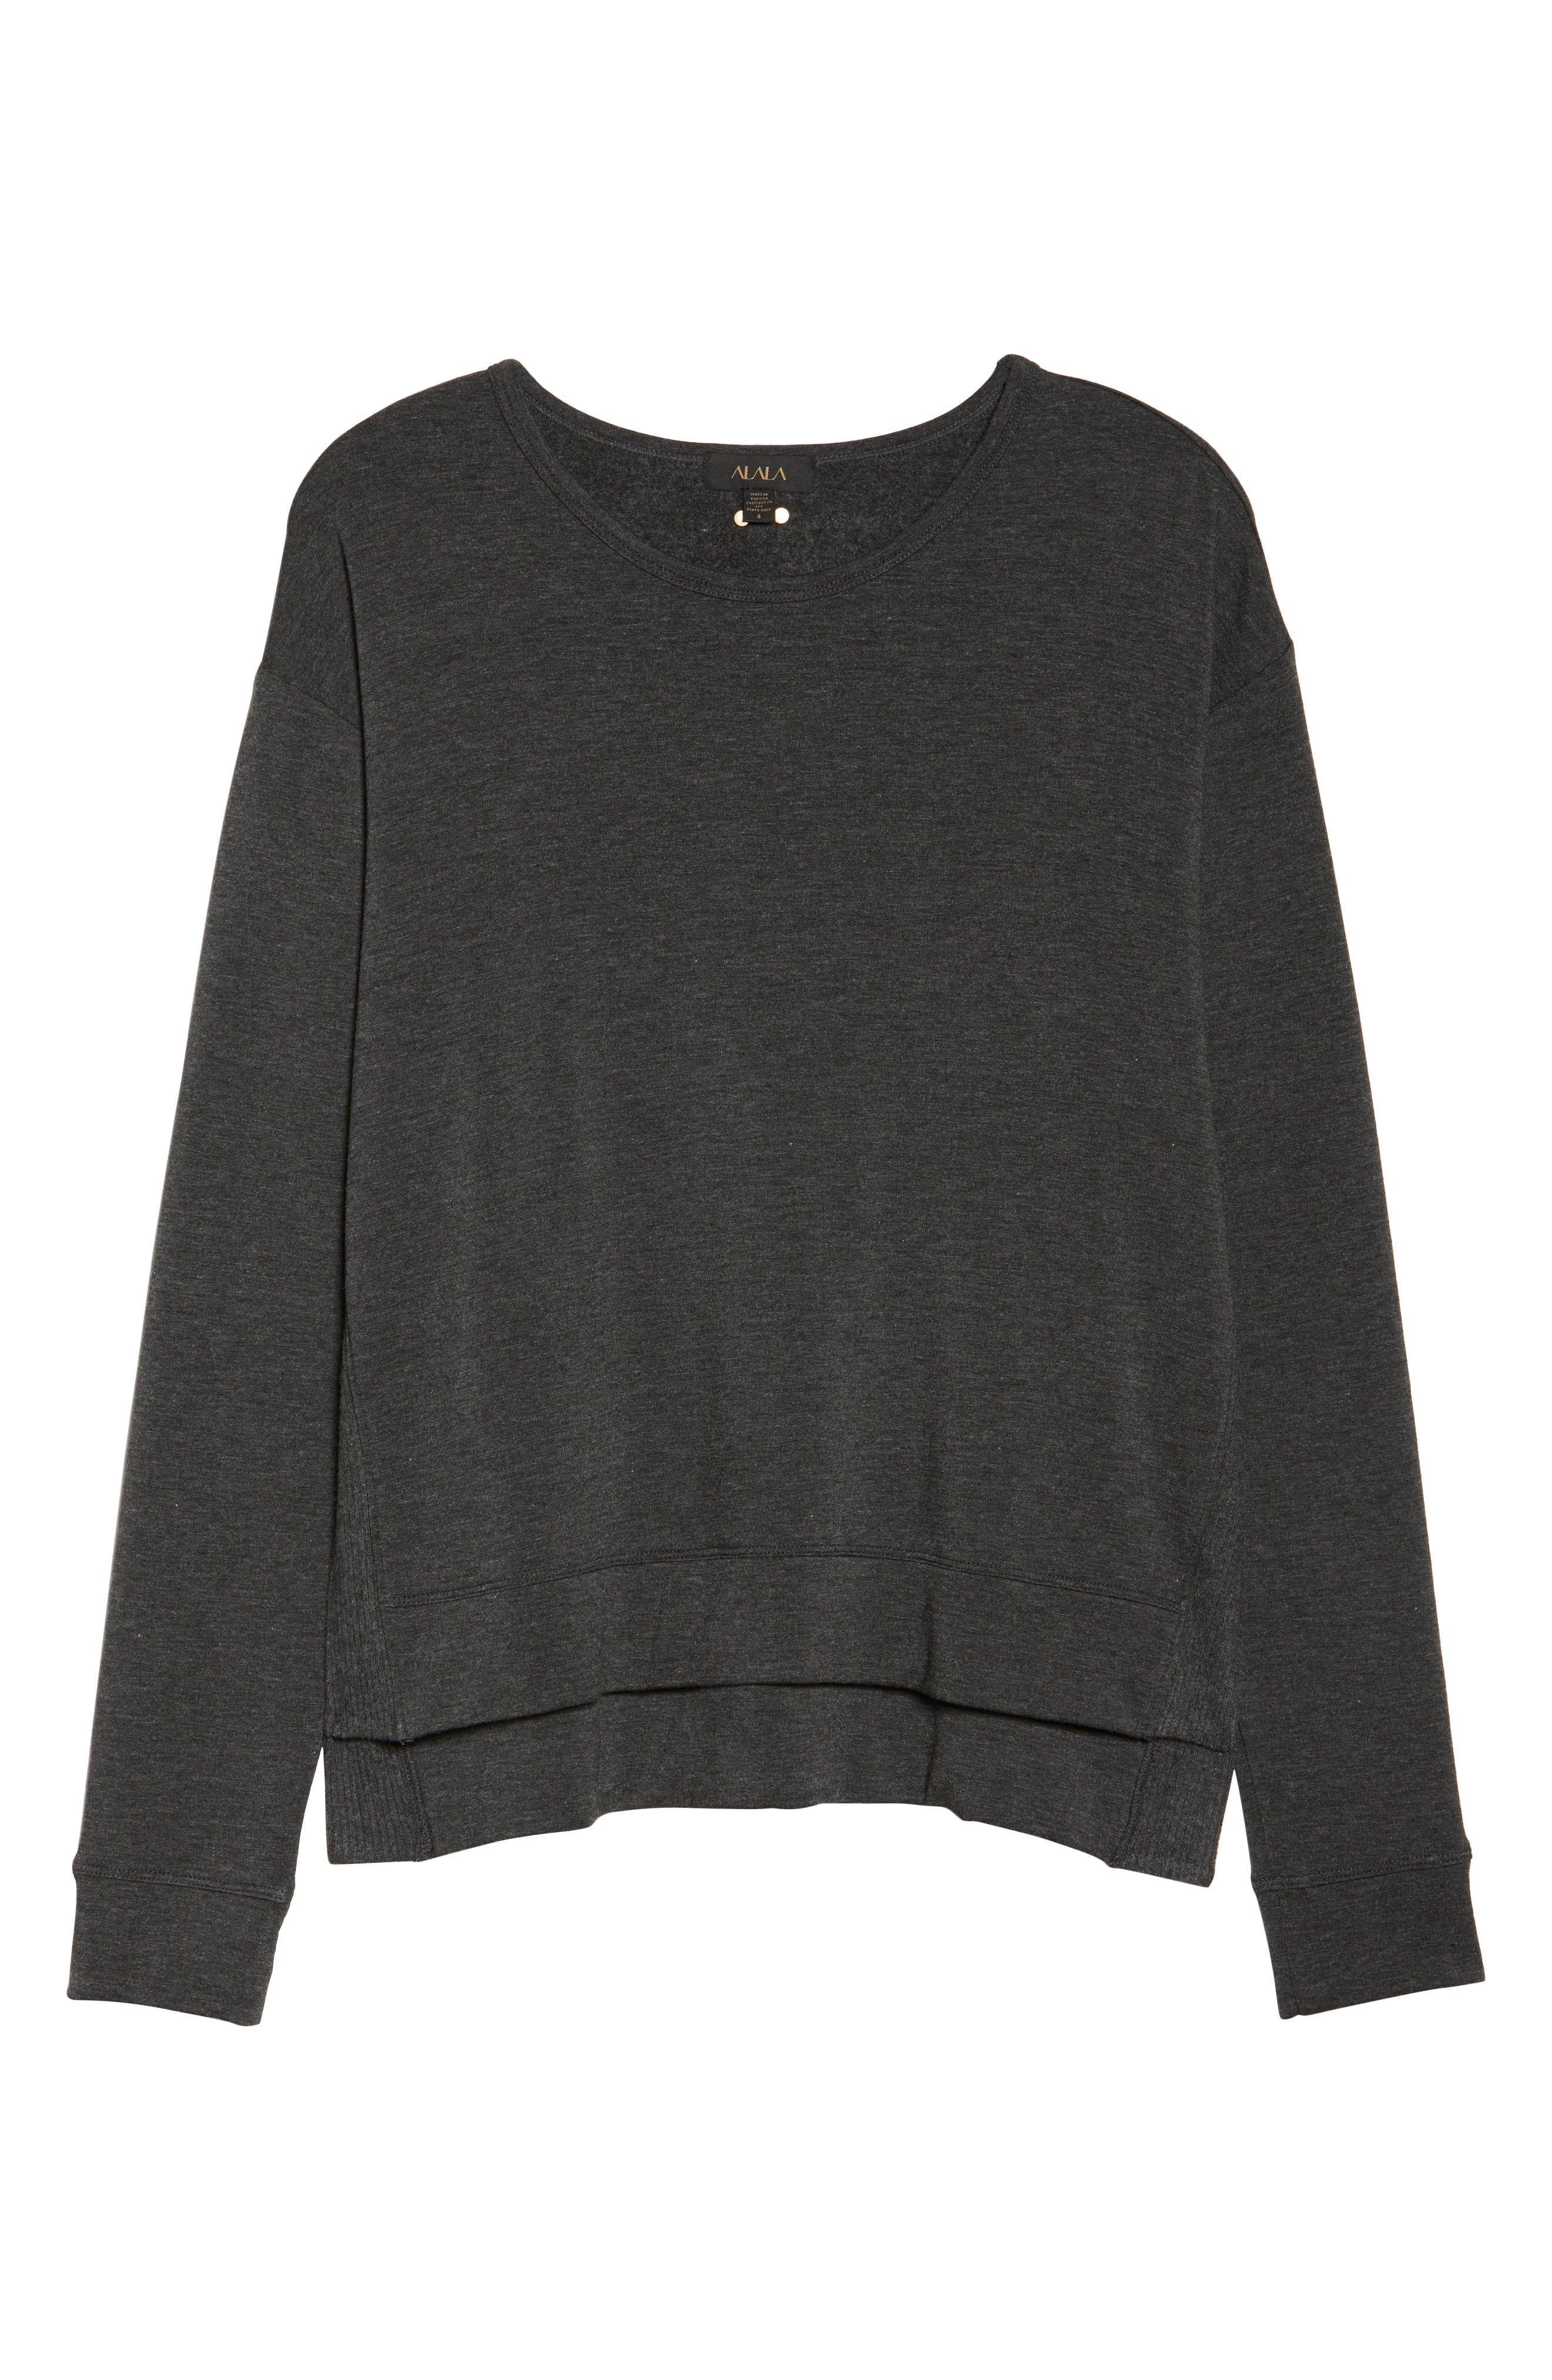 Crane Sweatshirt,                             Alternate thumbnail 6, color,                             Charcoal